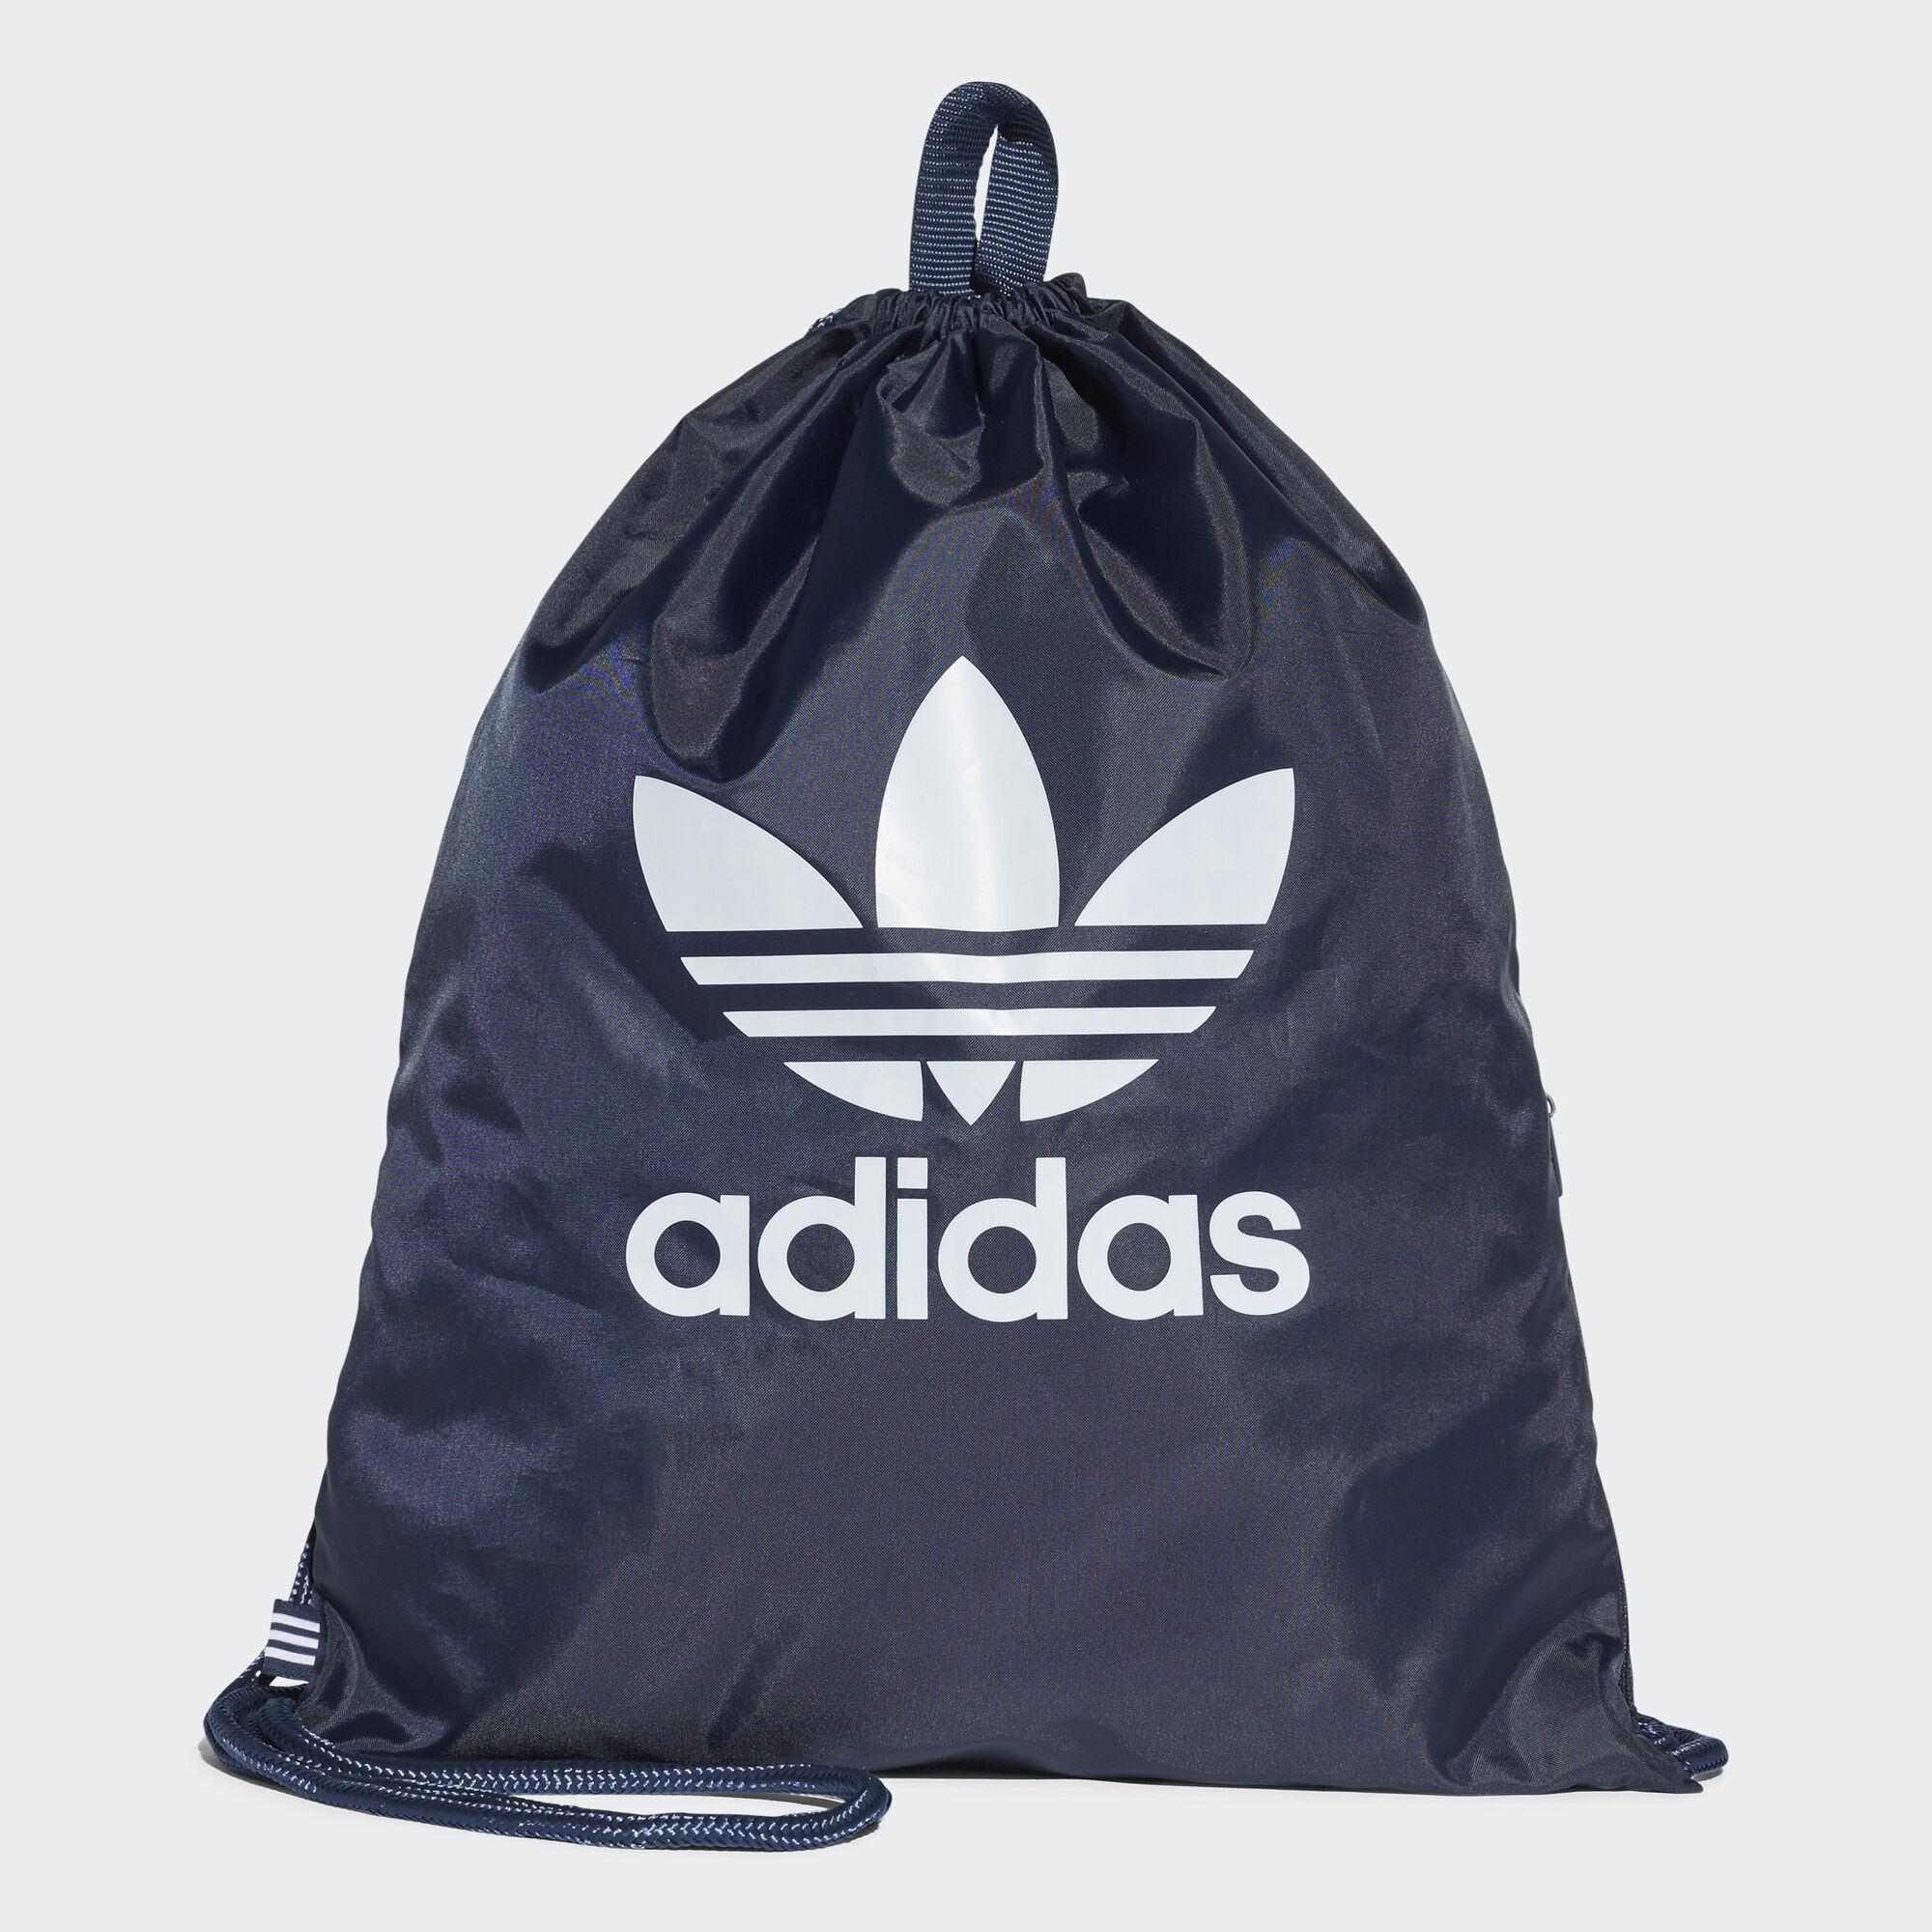 58c3f26d9193 Buy beg adidas original   OFF50% Discounted